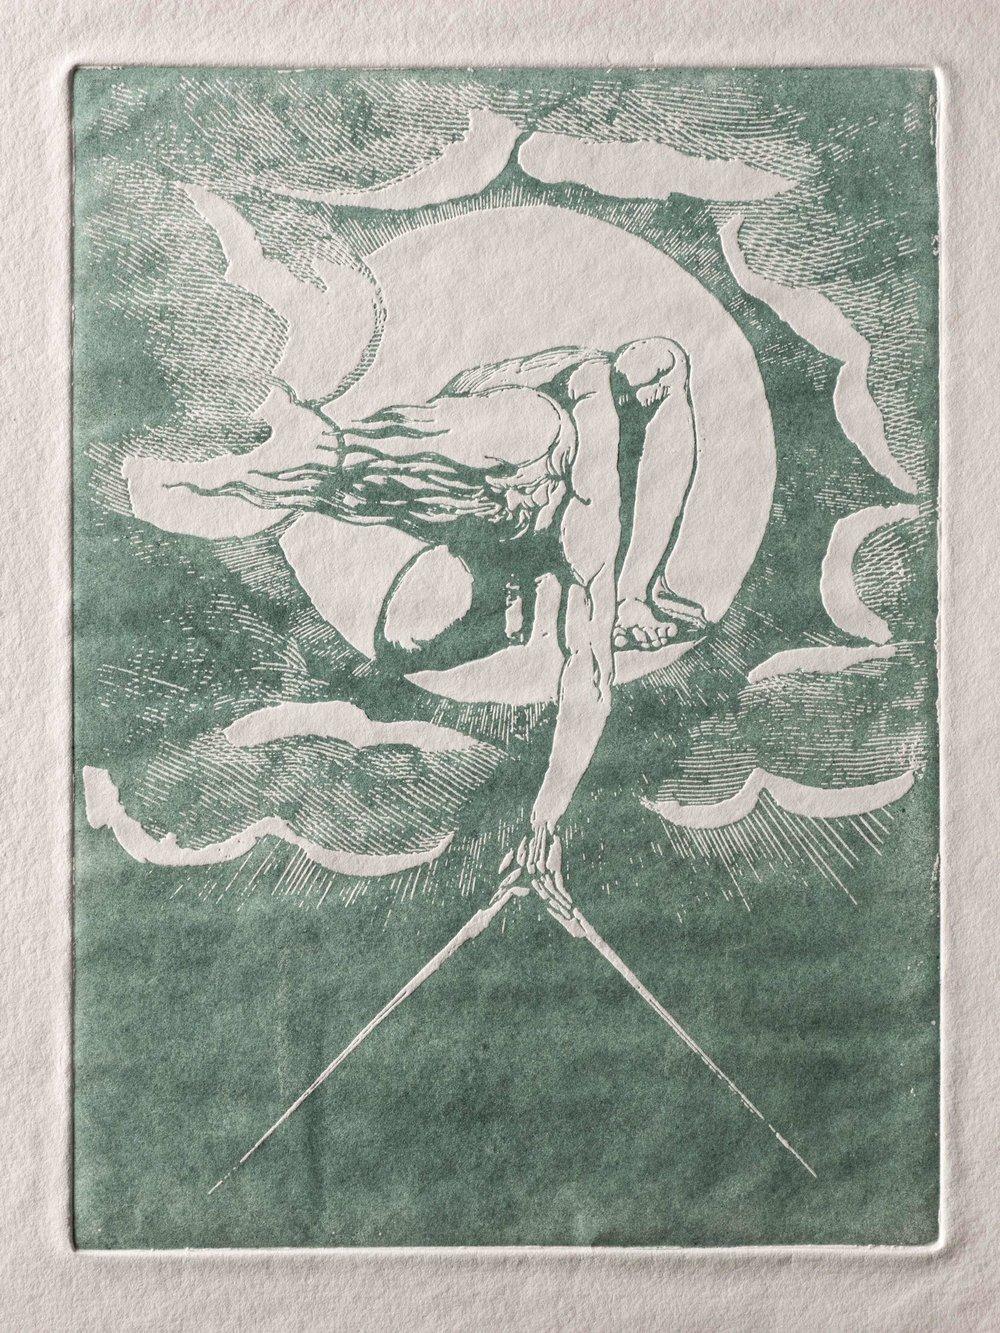 William-Blake-Europe-A-Prophecy-Frontispiece.jpg